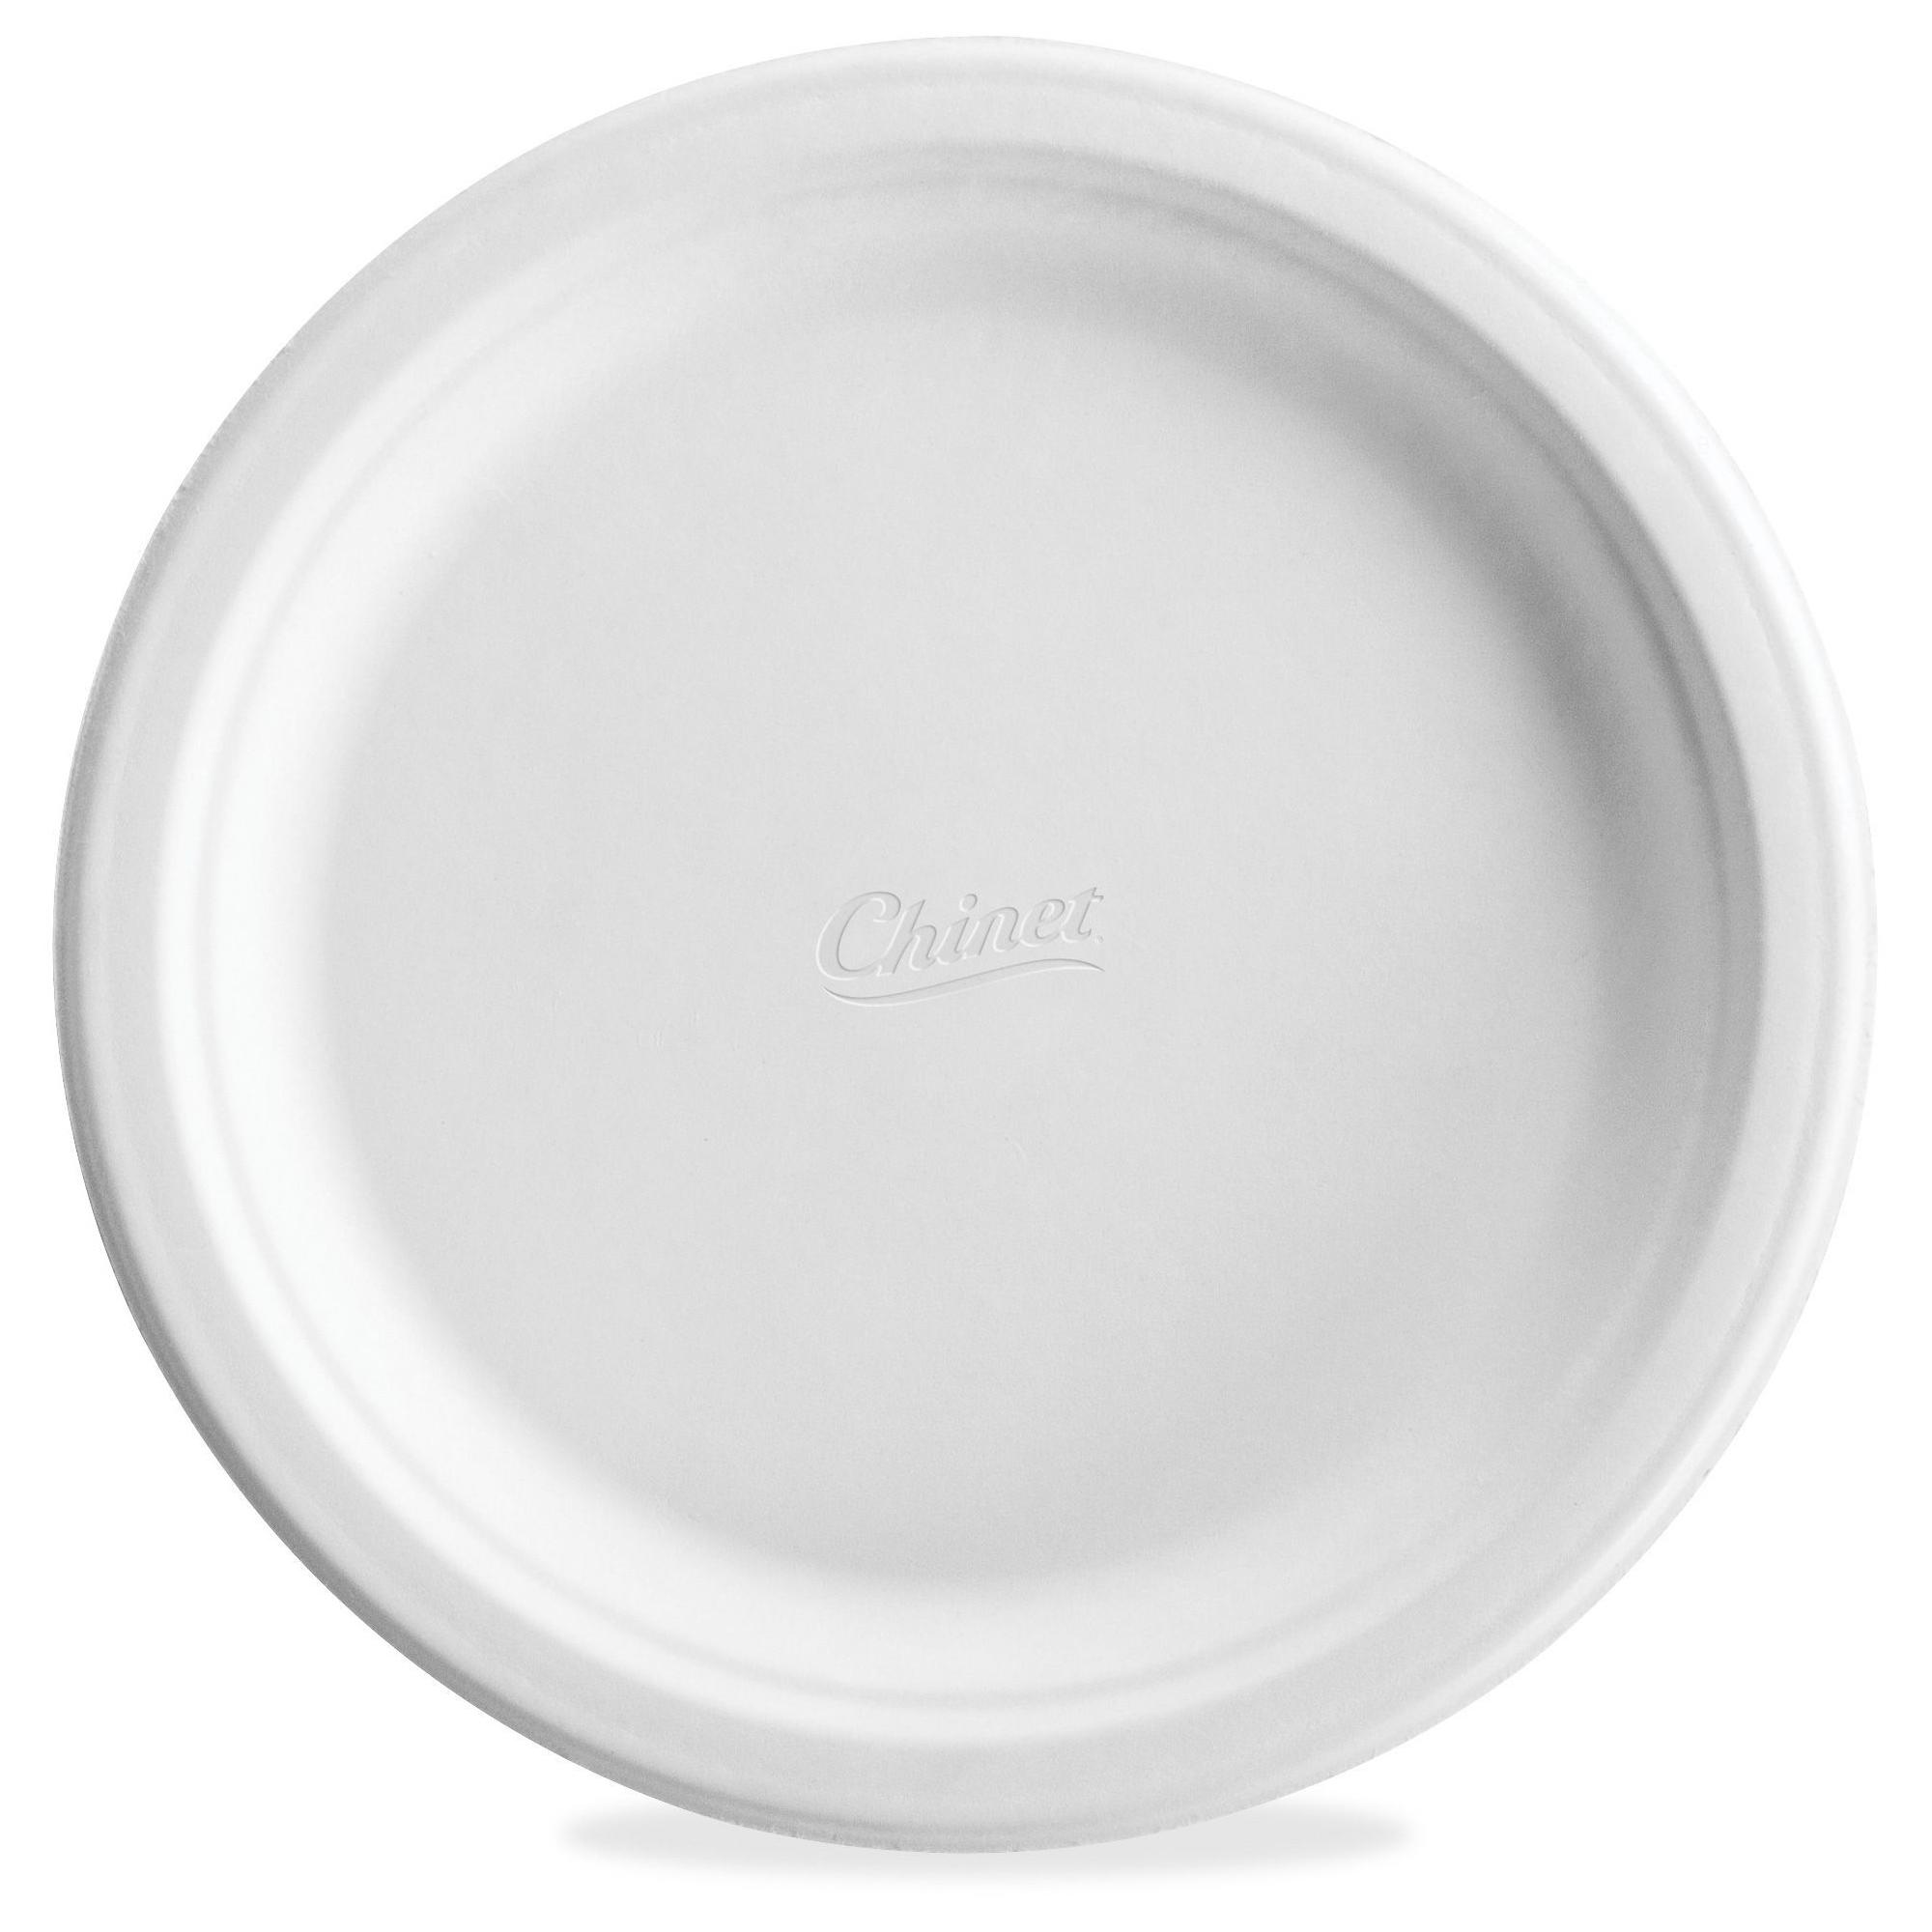 Chinet Classic White Molded Plates 6 Diameter Dinner Plate